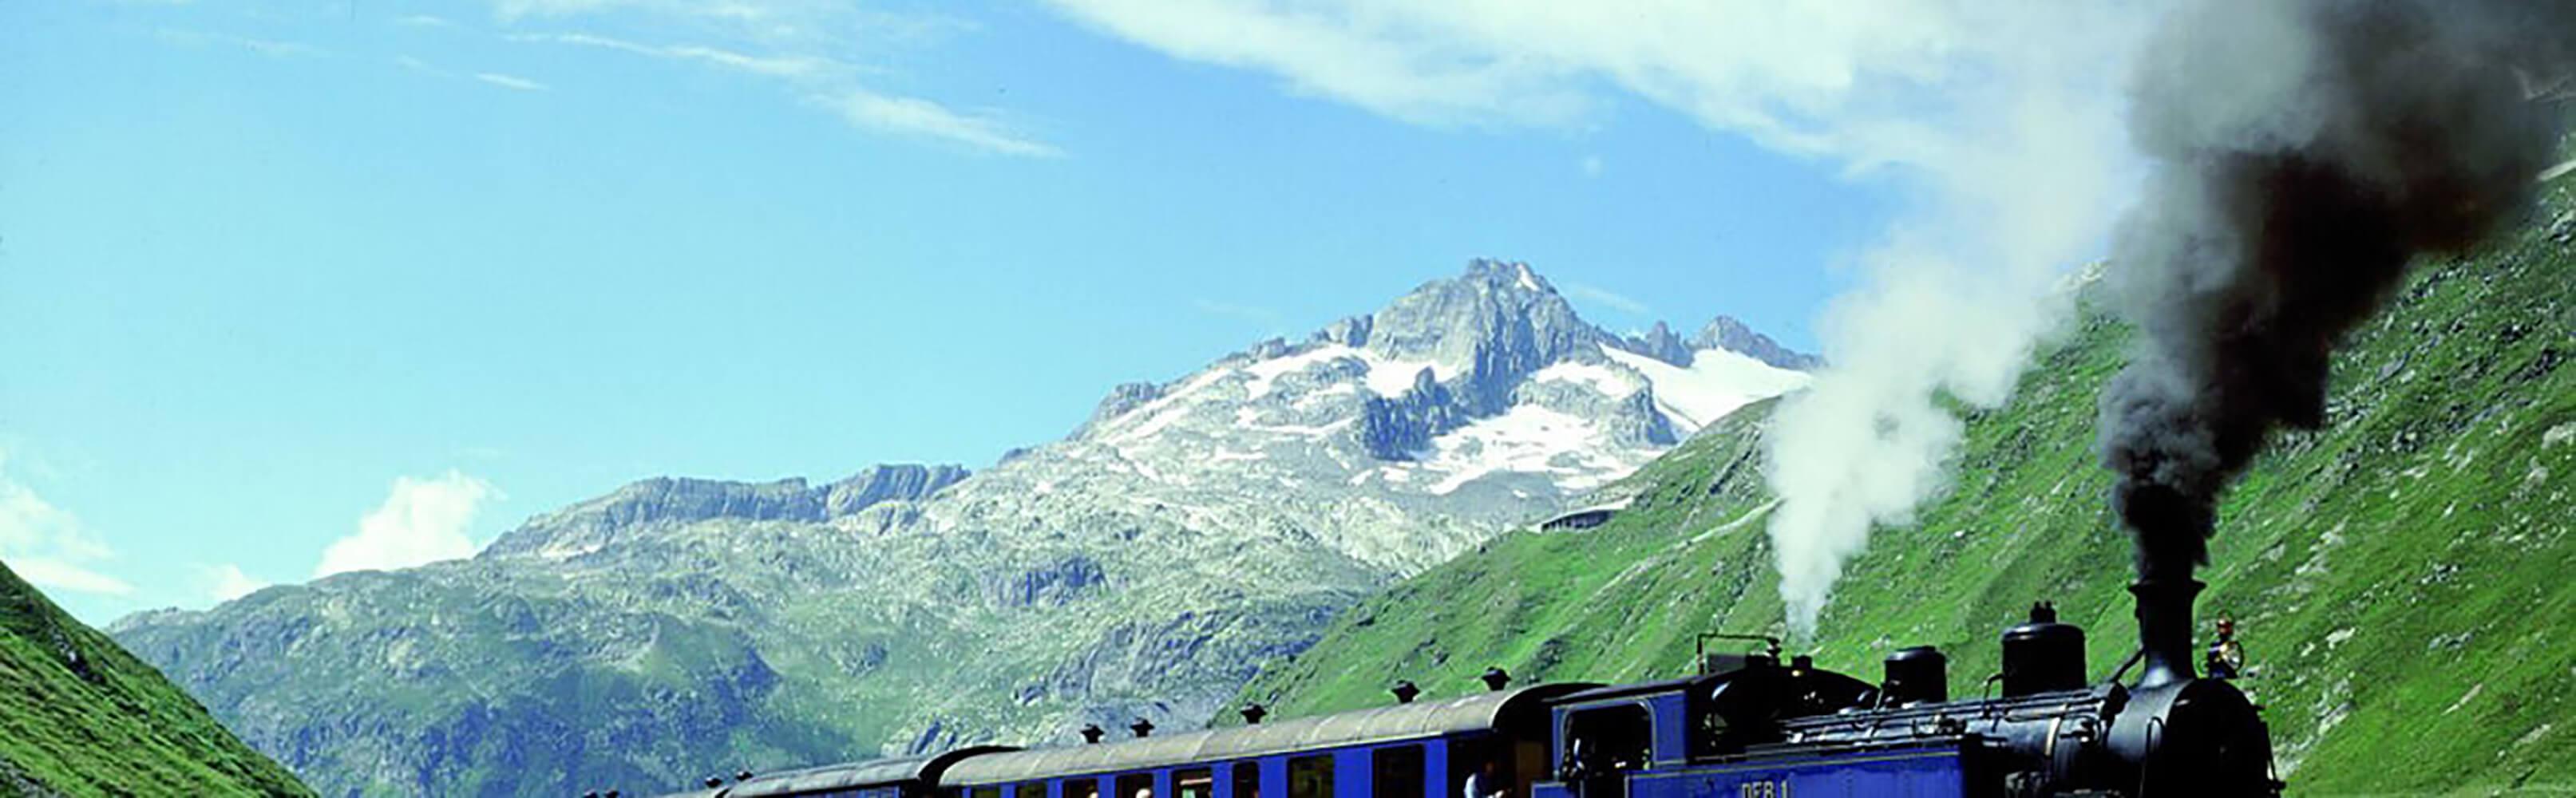 Dampfbahn Furka-Bergstrecke 1